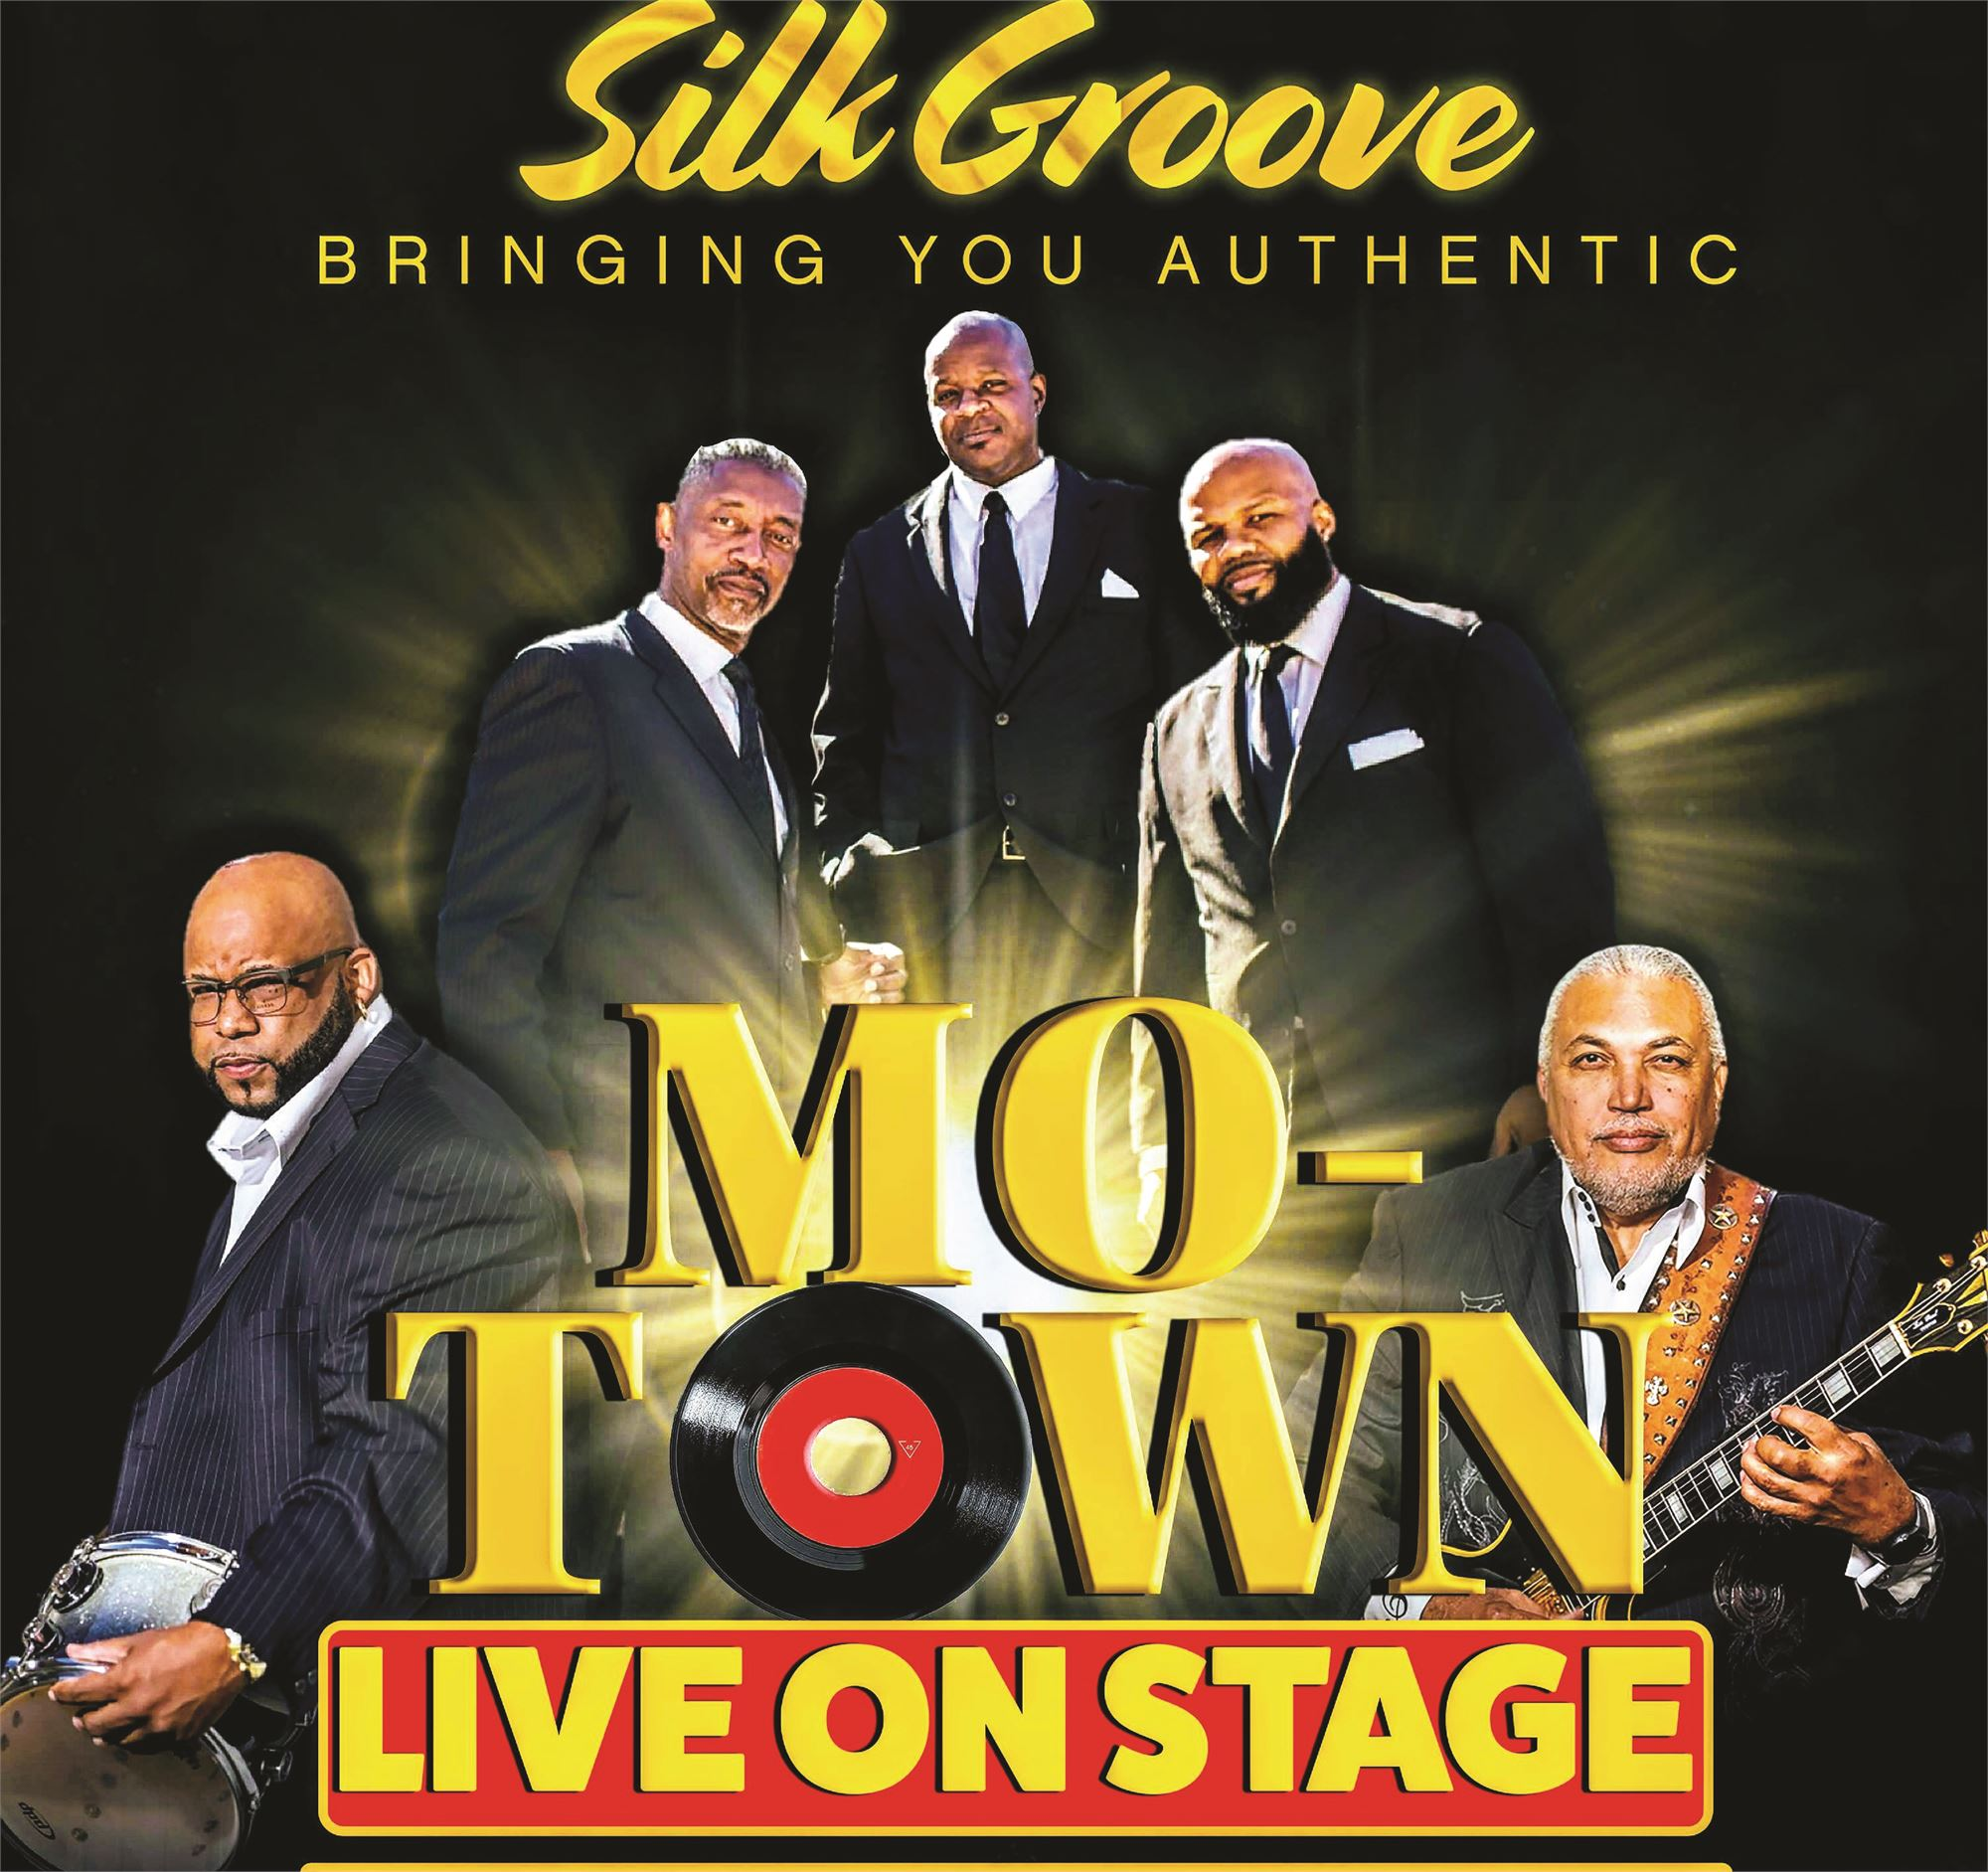 Silk Groove